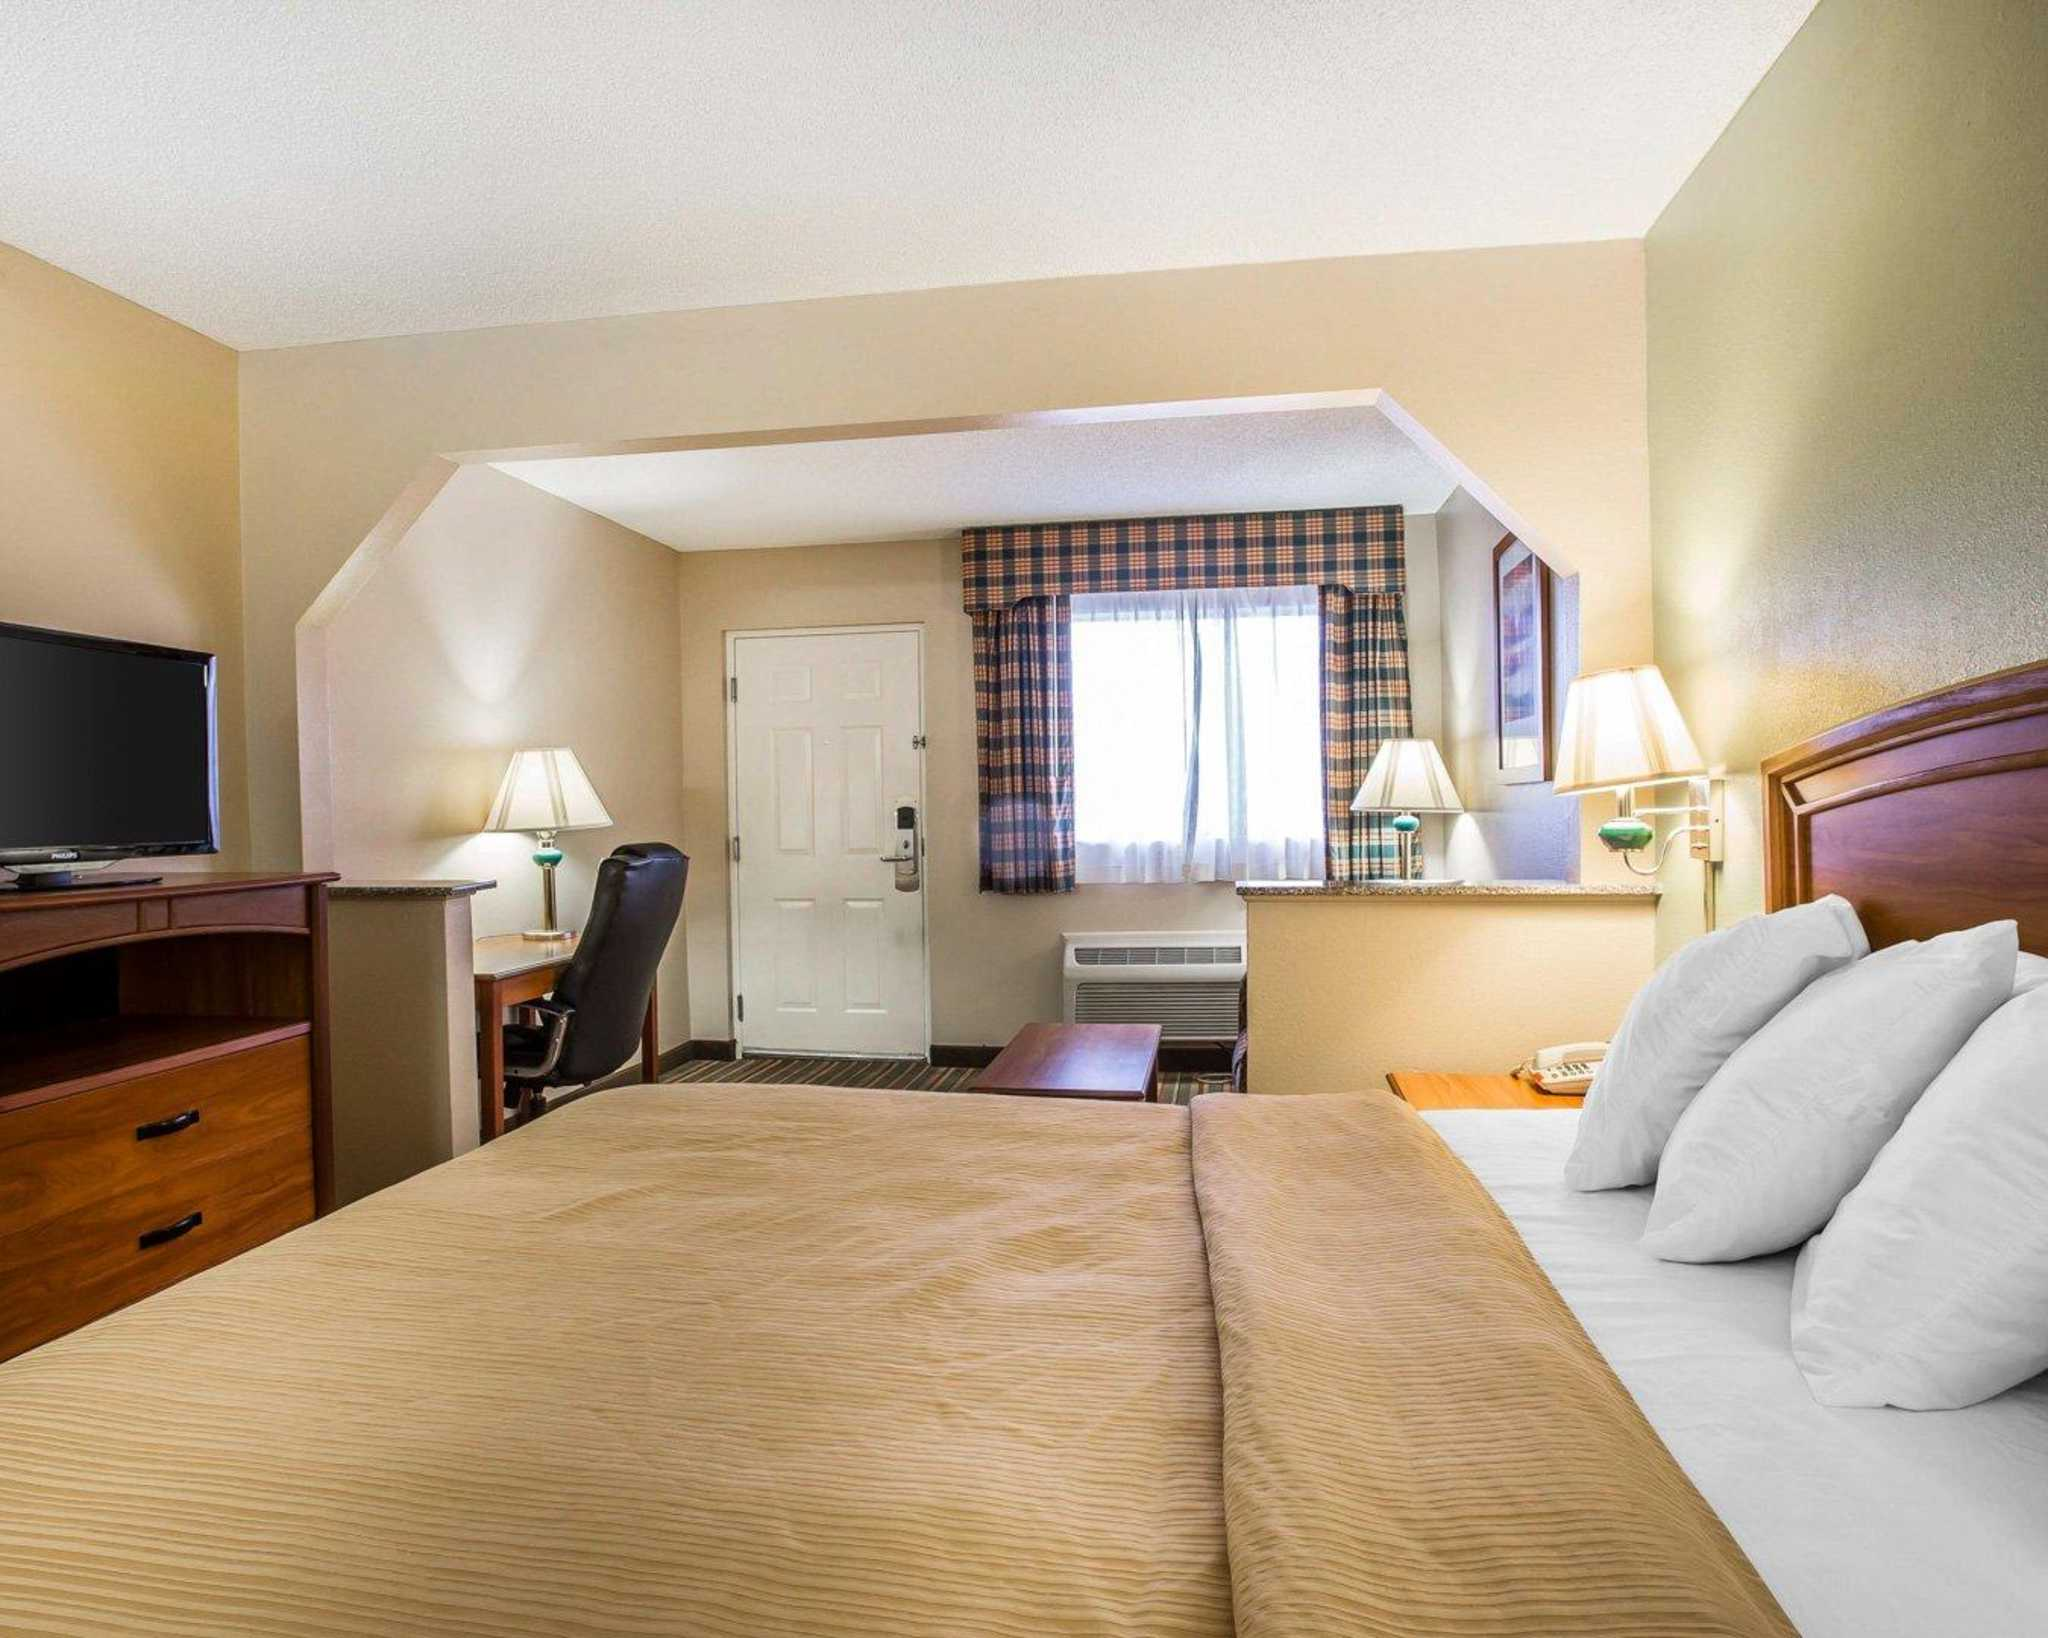 Quality Inn & Suites Dublin image 16